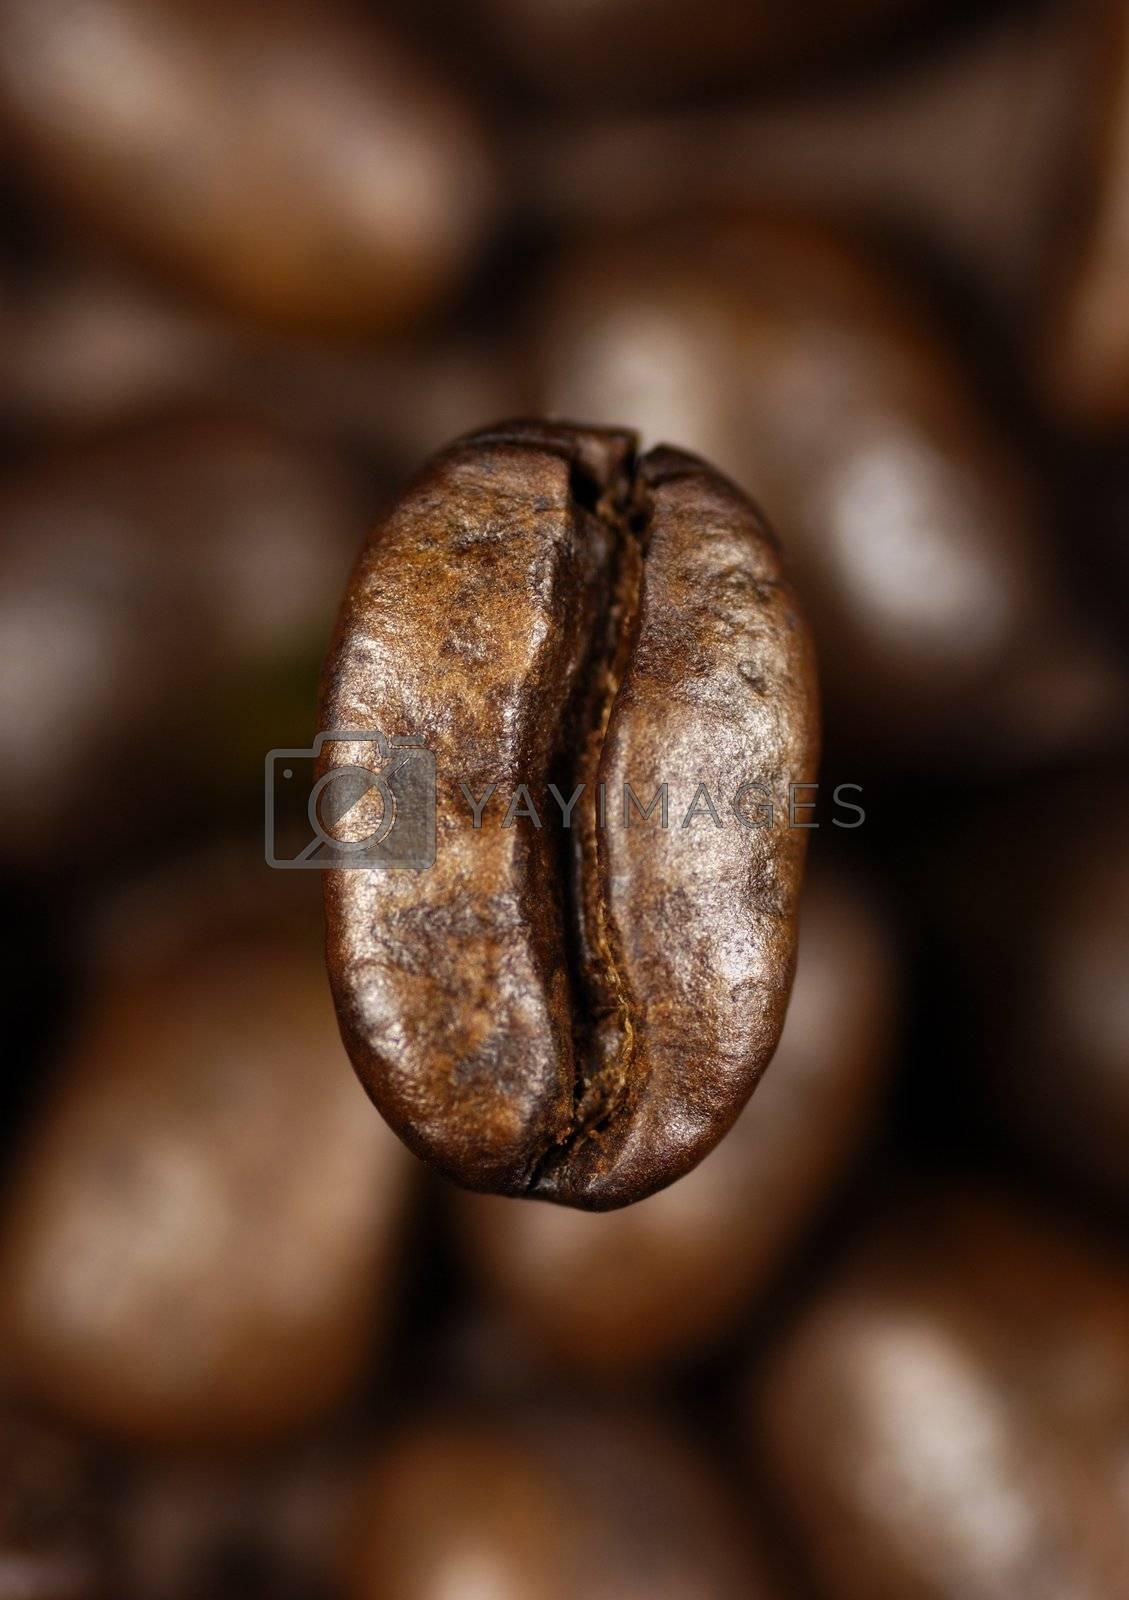 single coffee bean by massman